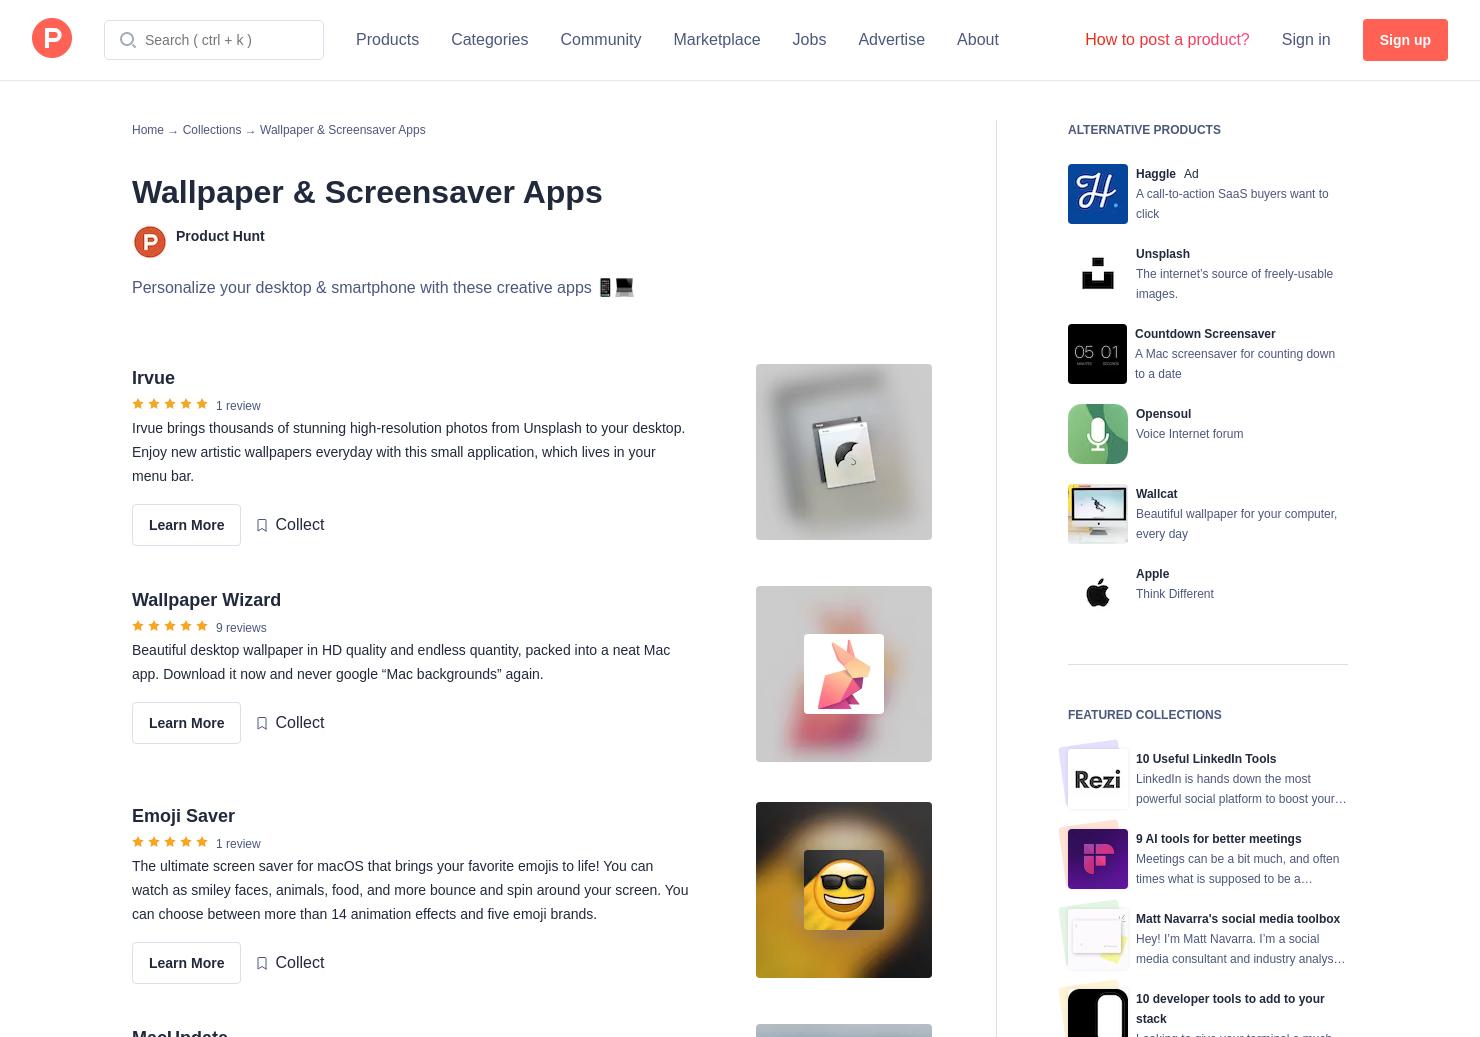 Wallpaper & Screensaver Apps   Product Hunt